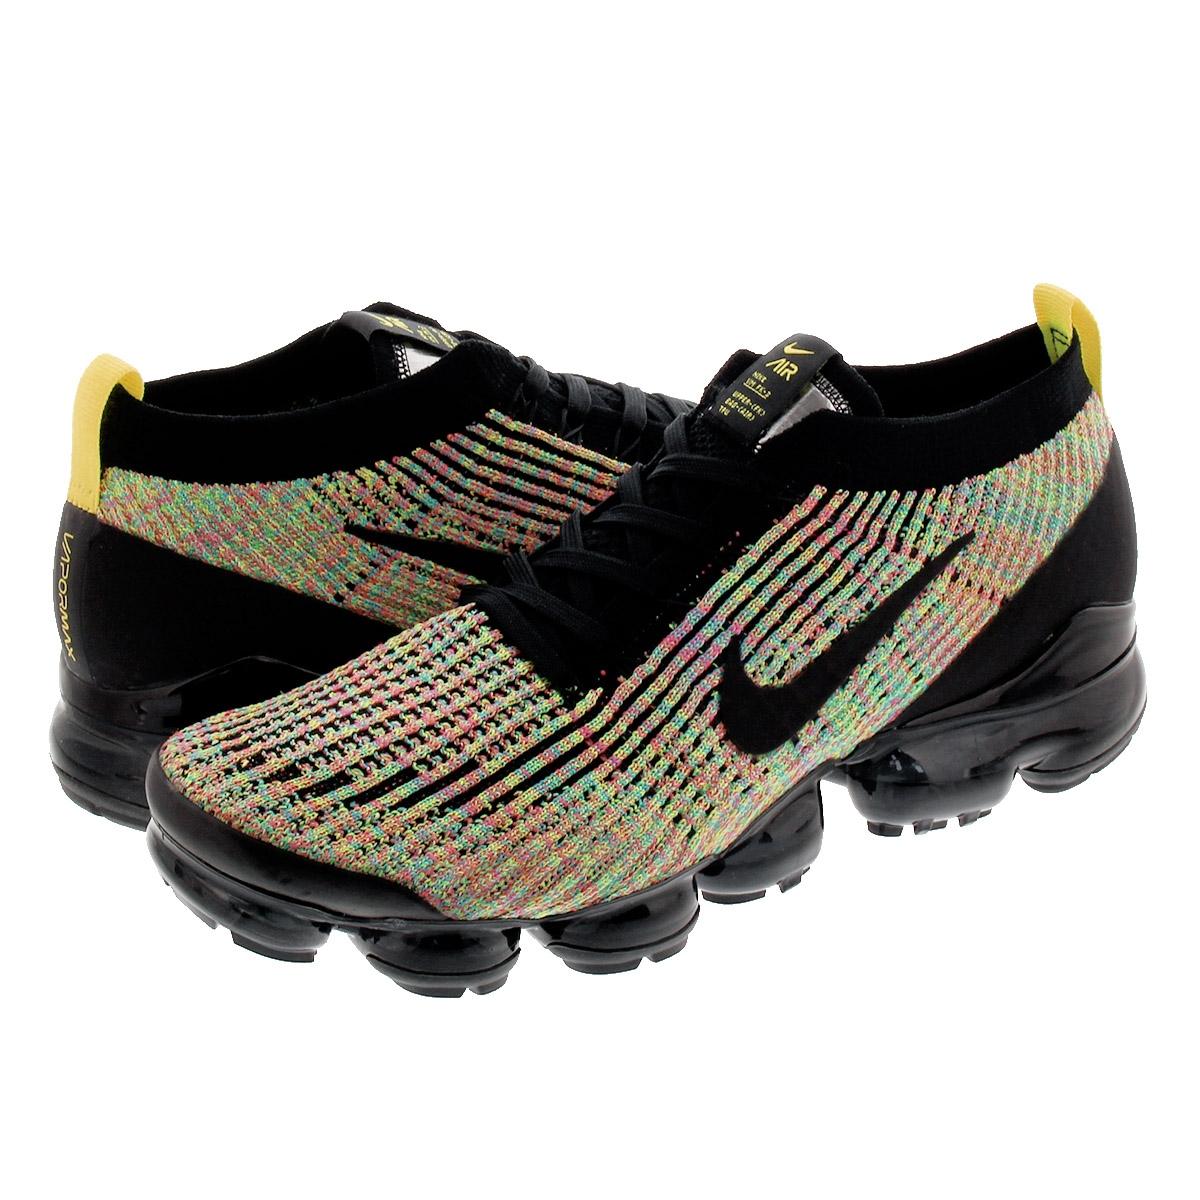 NIKE AIR VAPORMAX FLYKNIT 3 Nike vapor max fried food knit 3 BLACKBLACKVOLT aj6900 006